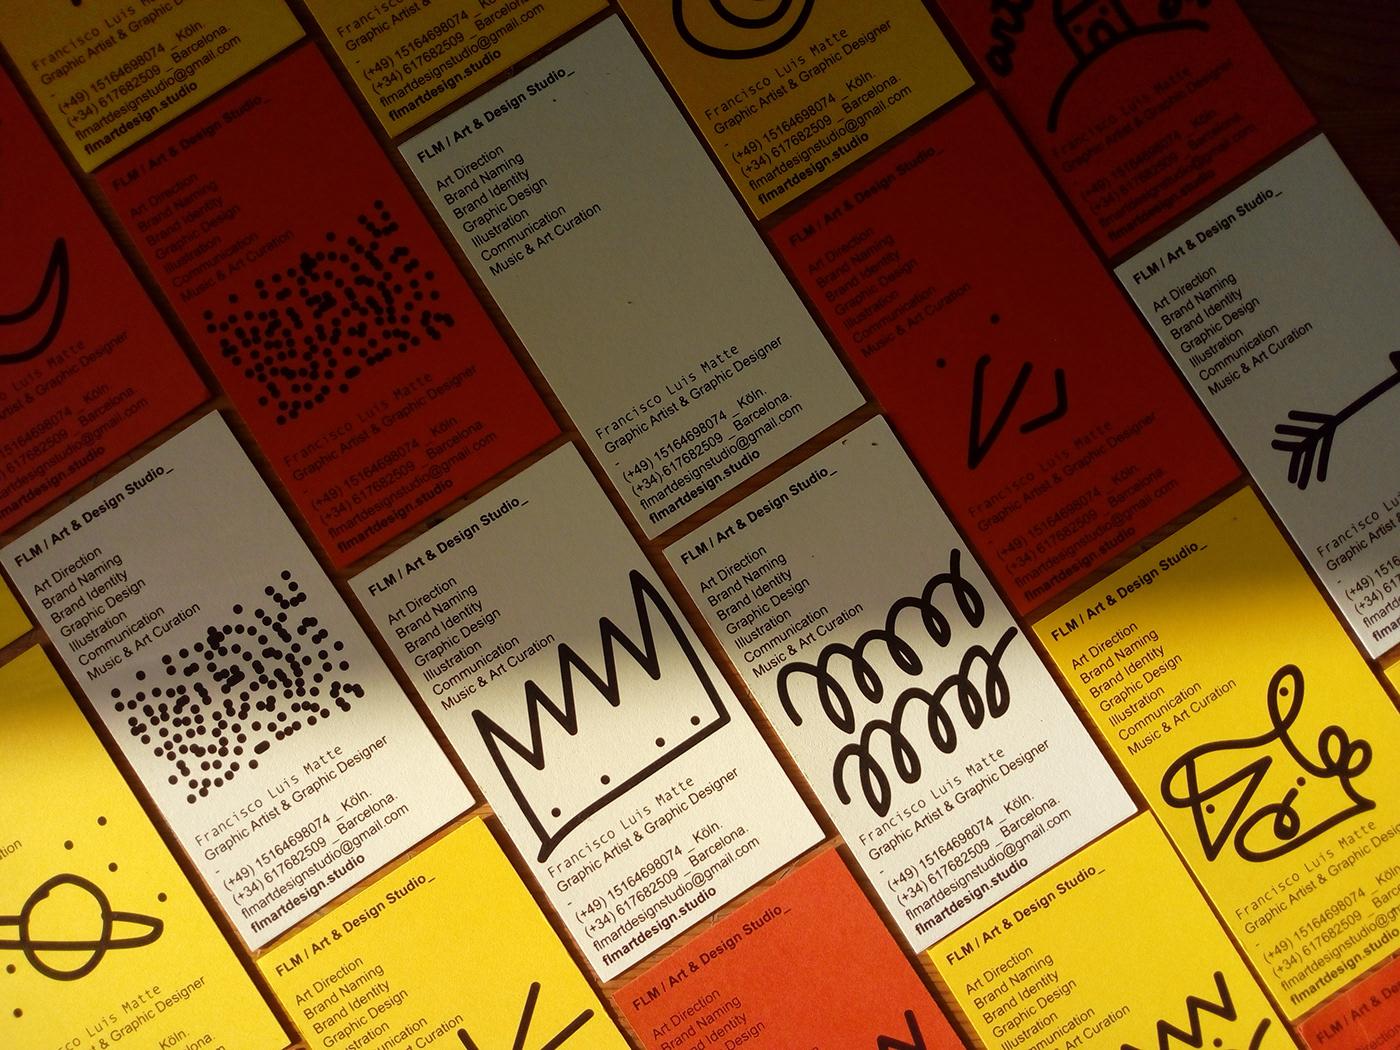 Image may contain: book, newspaper and menu